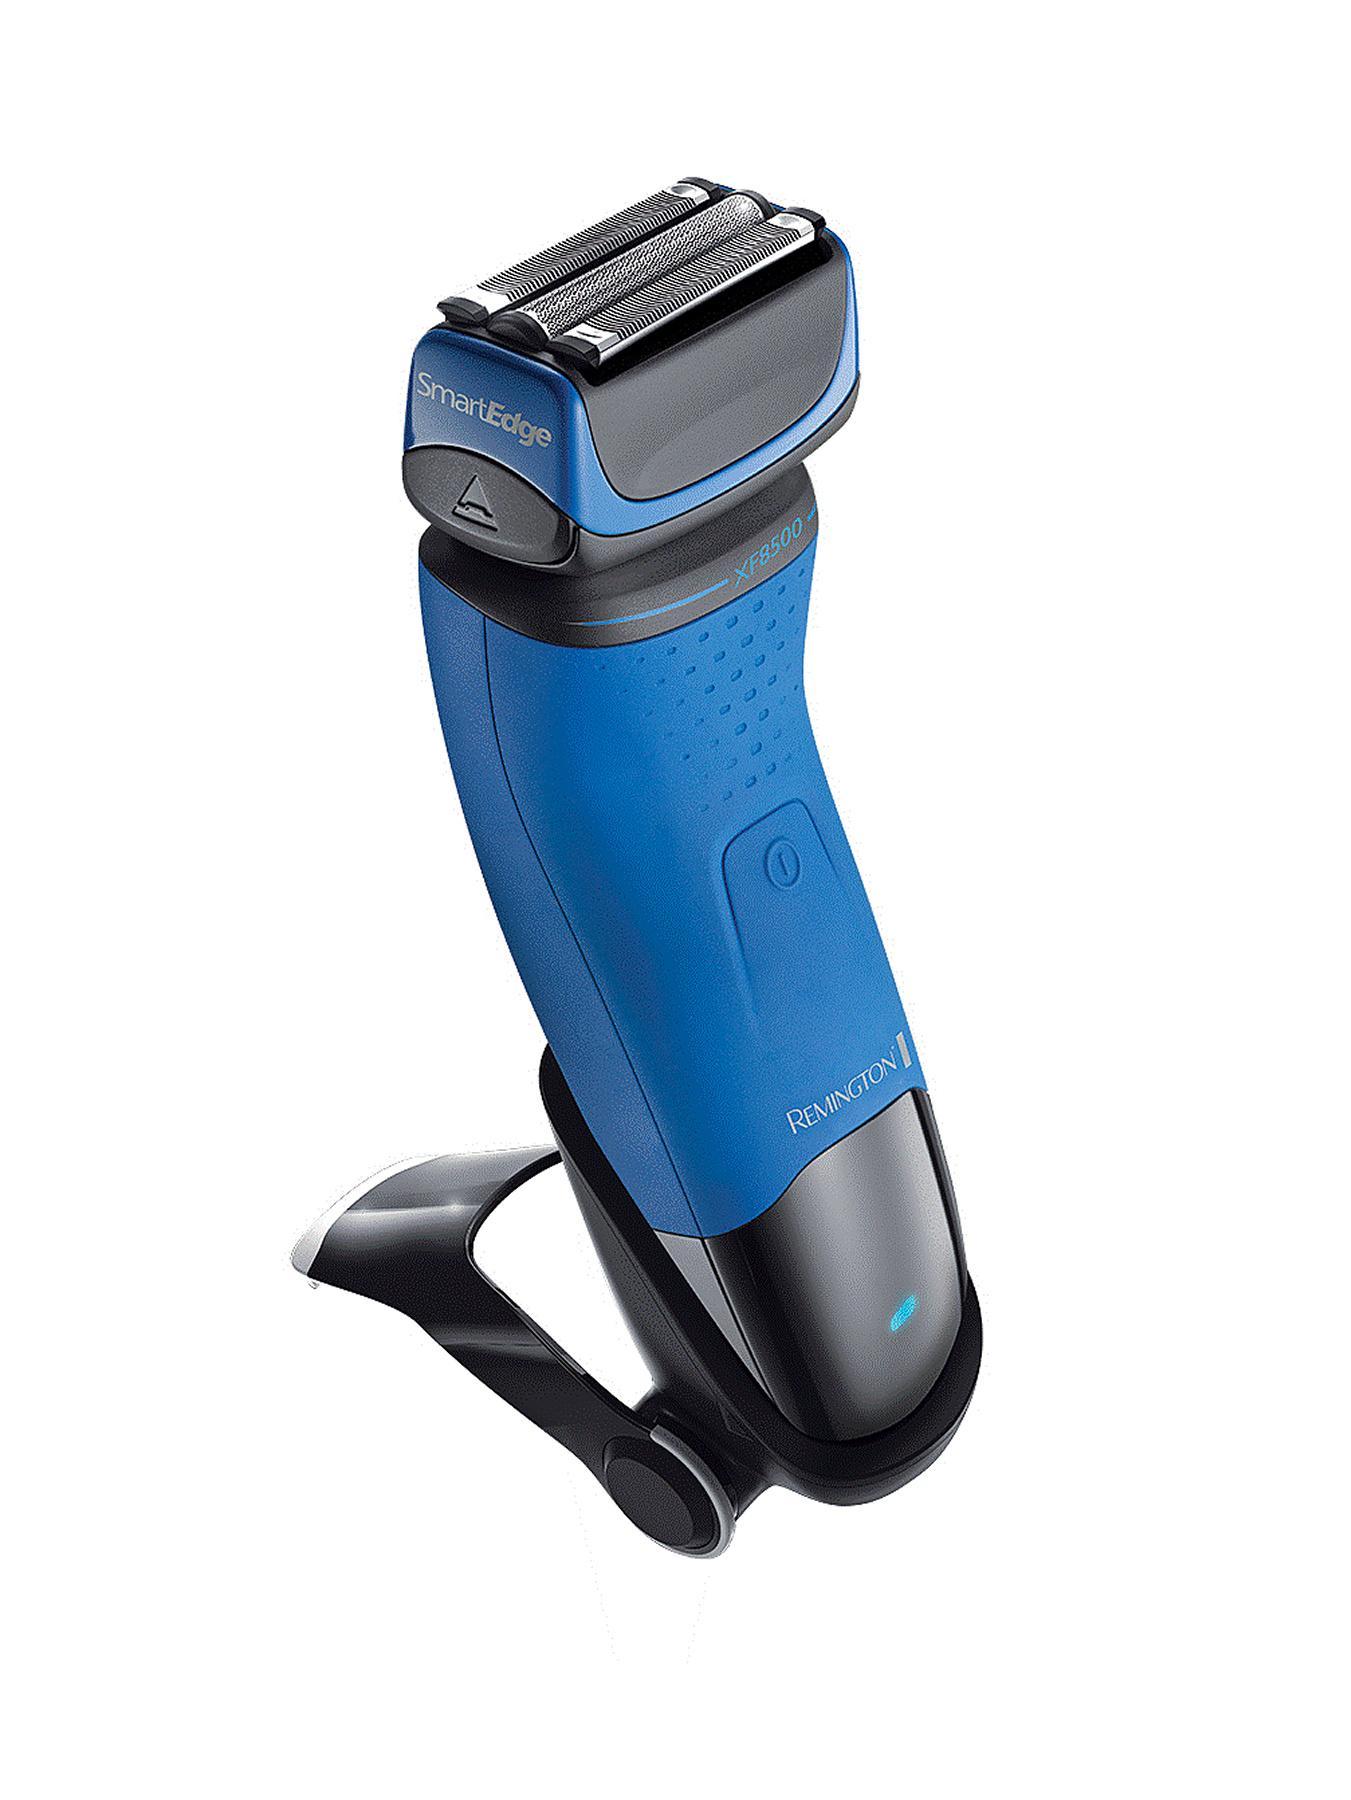 Remington SmartEdge Advanced Shaver Father's Day 2015 Gift Guide